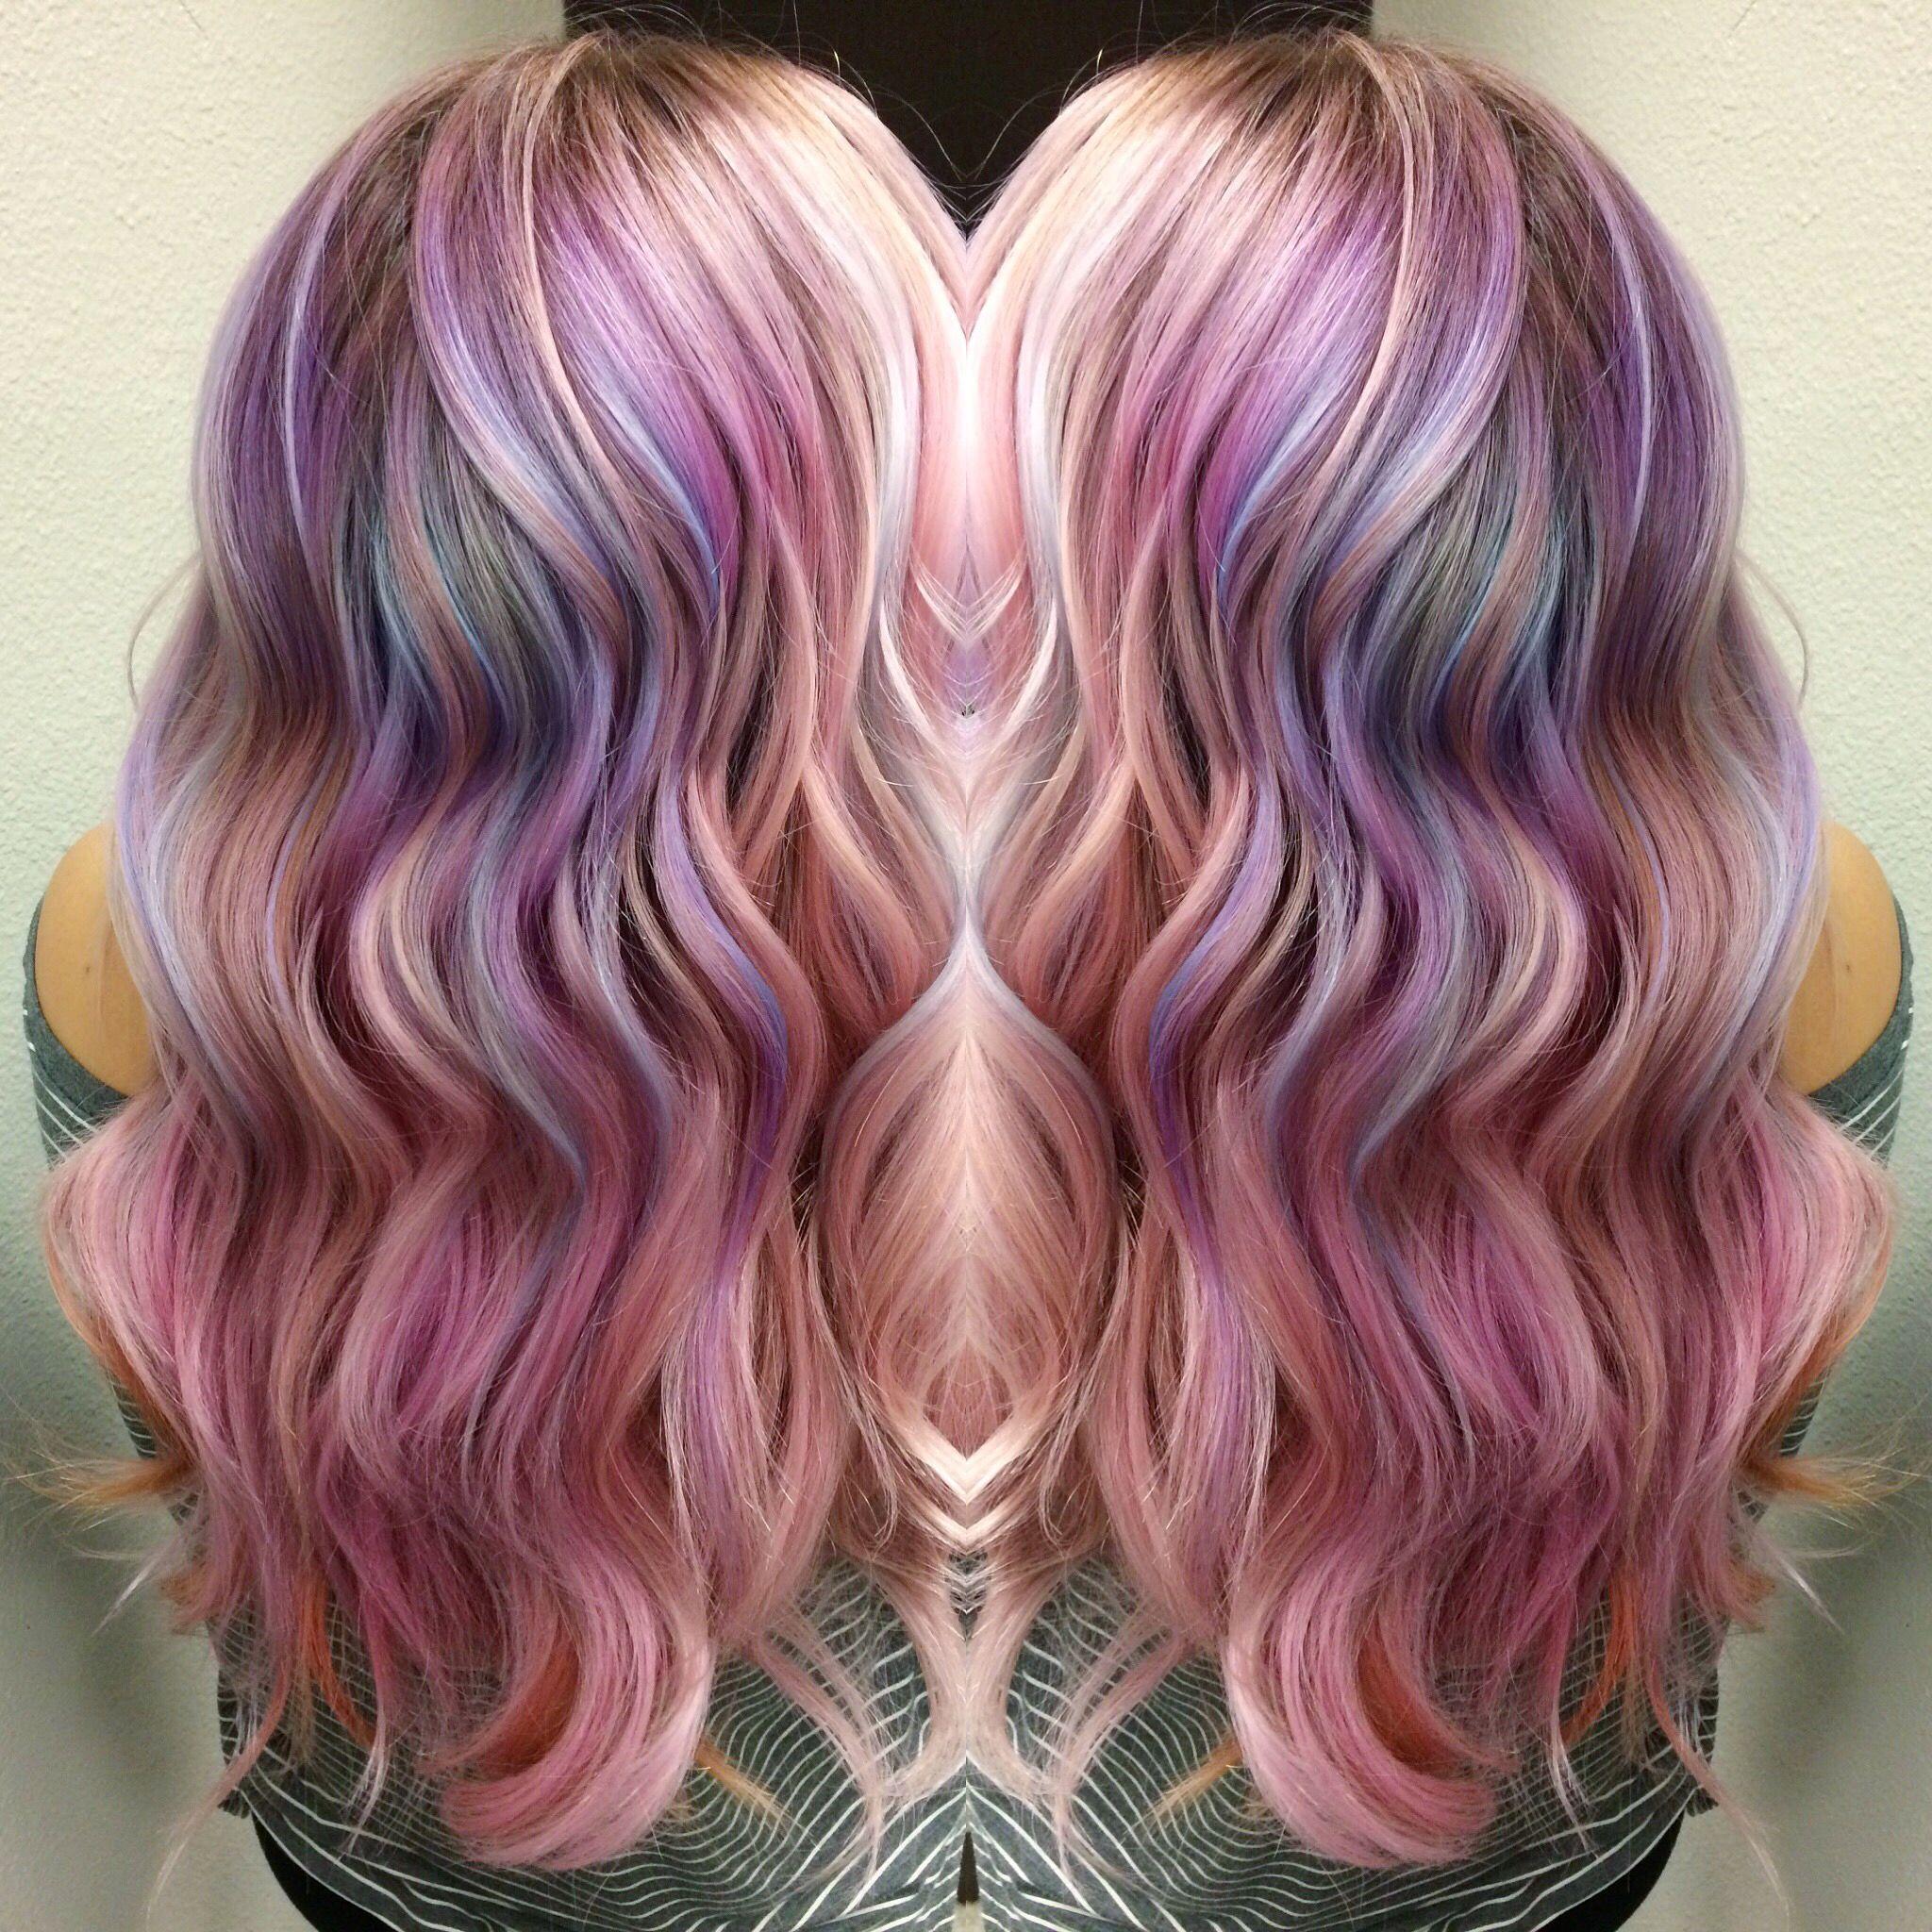 Hair style hair color rainbow hair mermaid hair whimsicalbrandi